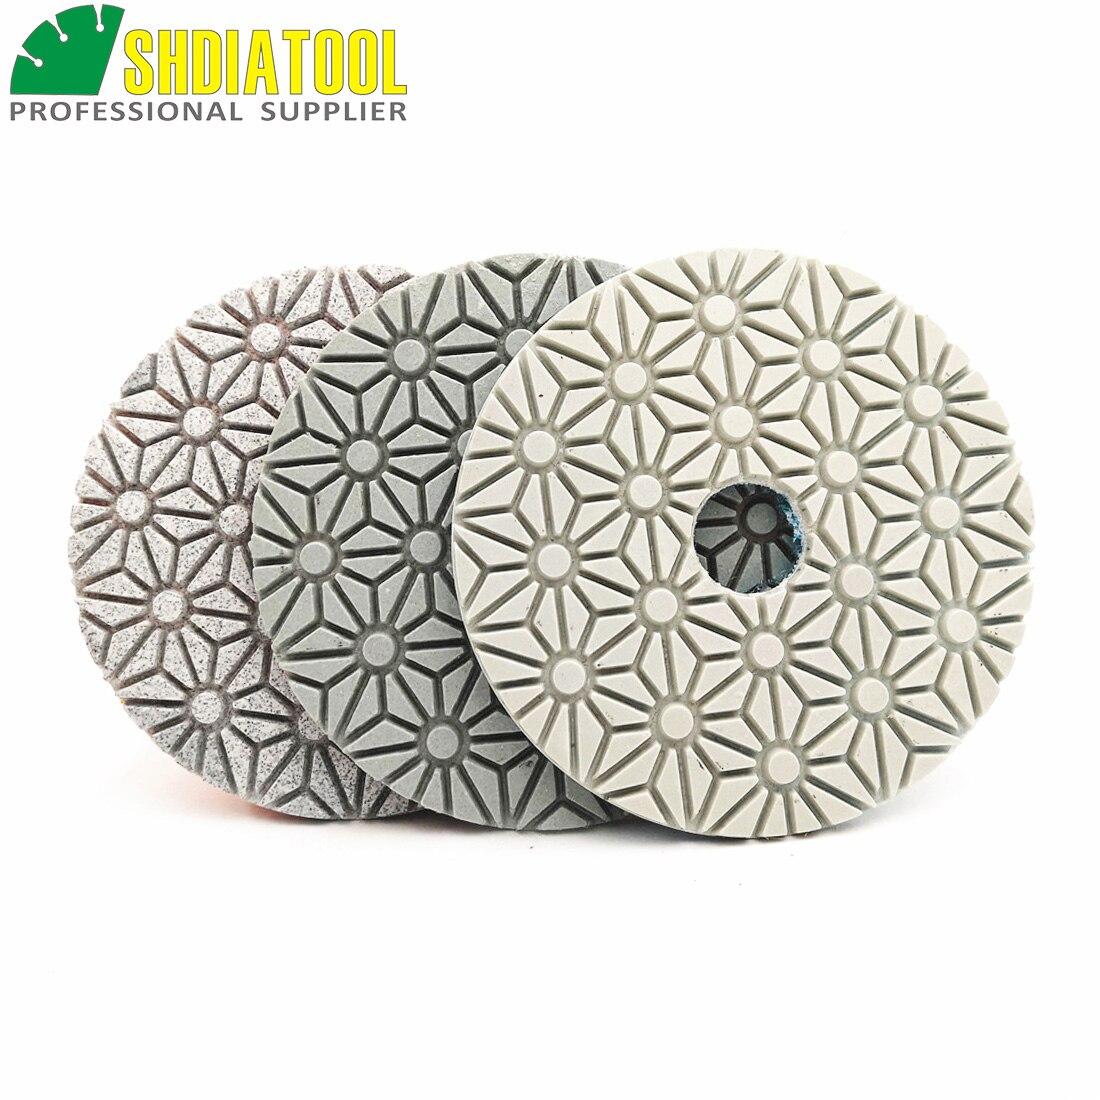 Shdiatool para dia, disco de lixa de diamante molhado ou seco, flexível 100mm/4 e 3 passos almofada mármore macio pedra polidor disco